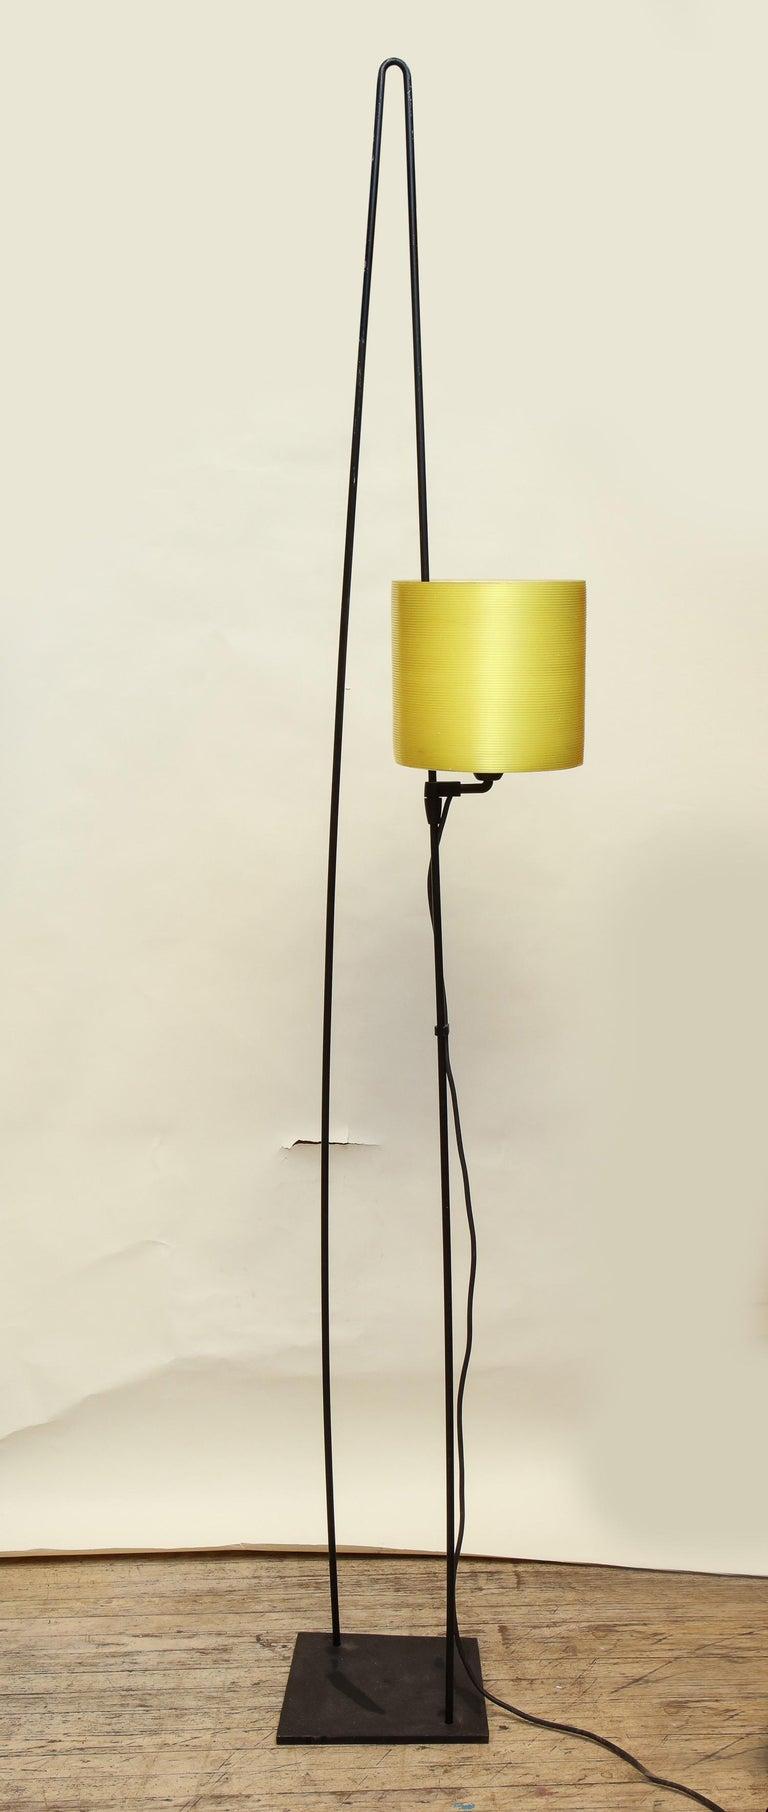 Italiana Luce Floor Lamp Mid-Century Modern Ion and Plexiglass, Italy, 1970 For Sale 4